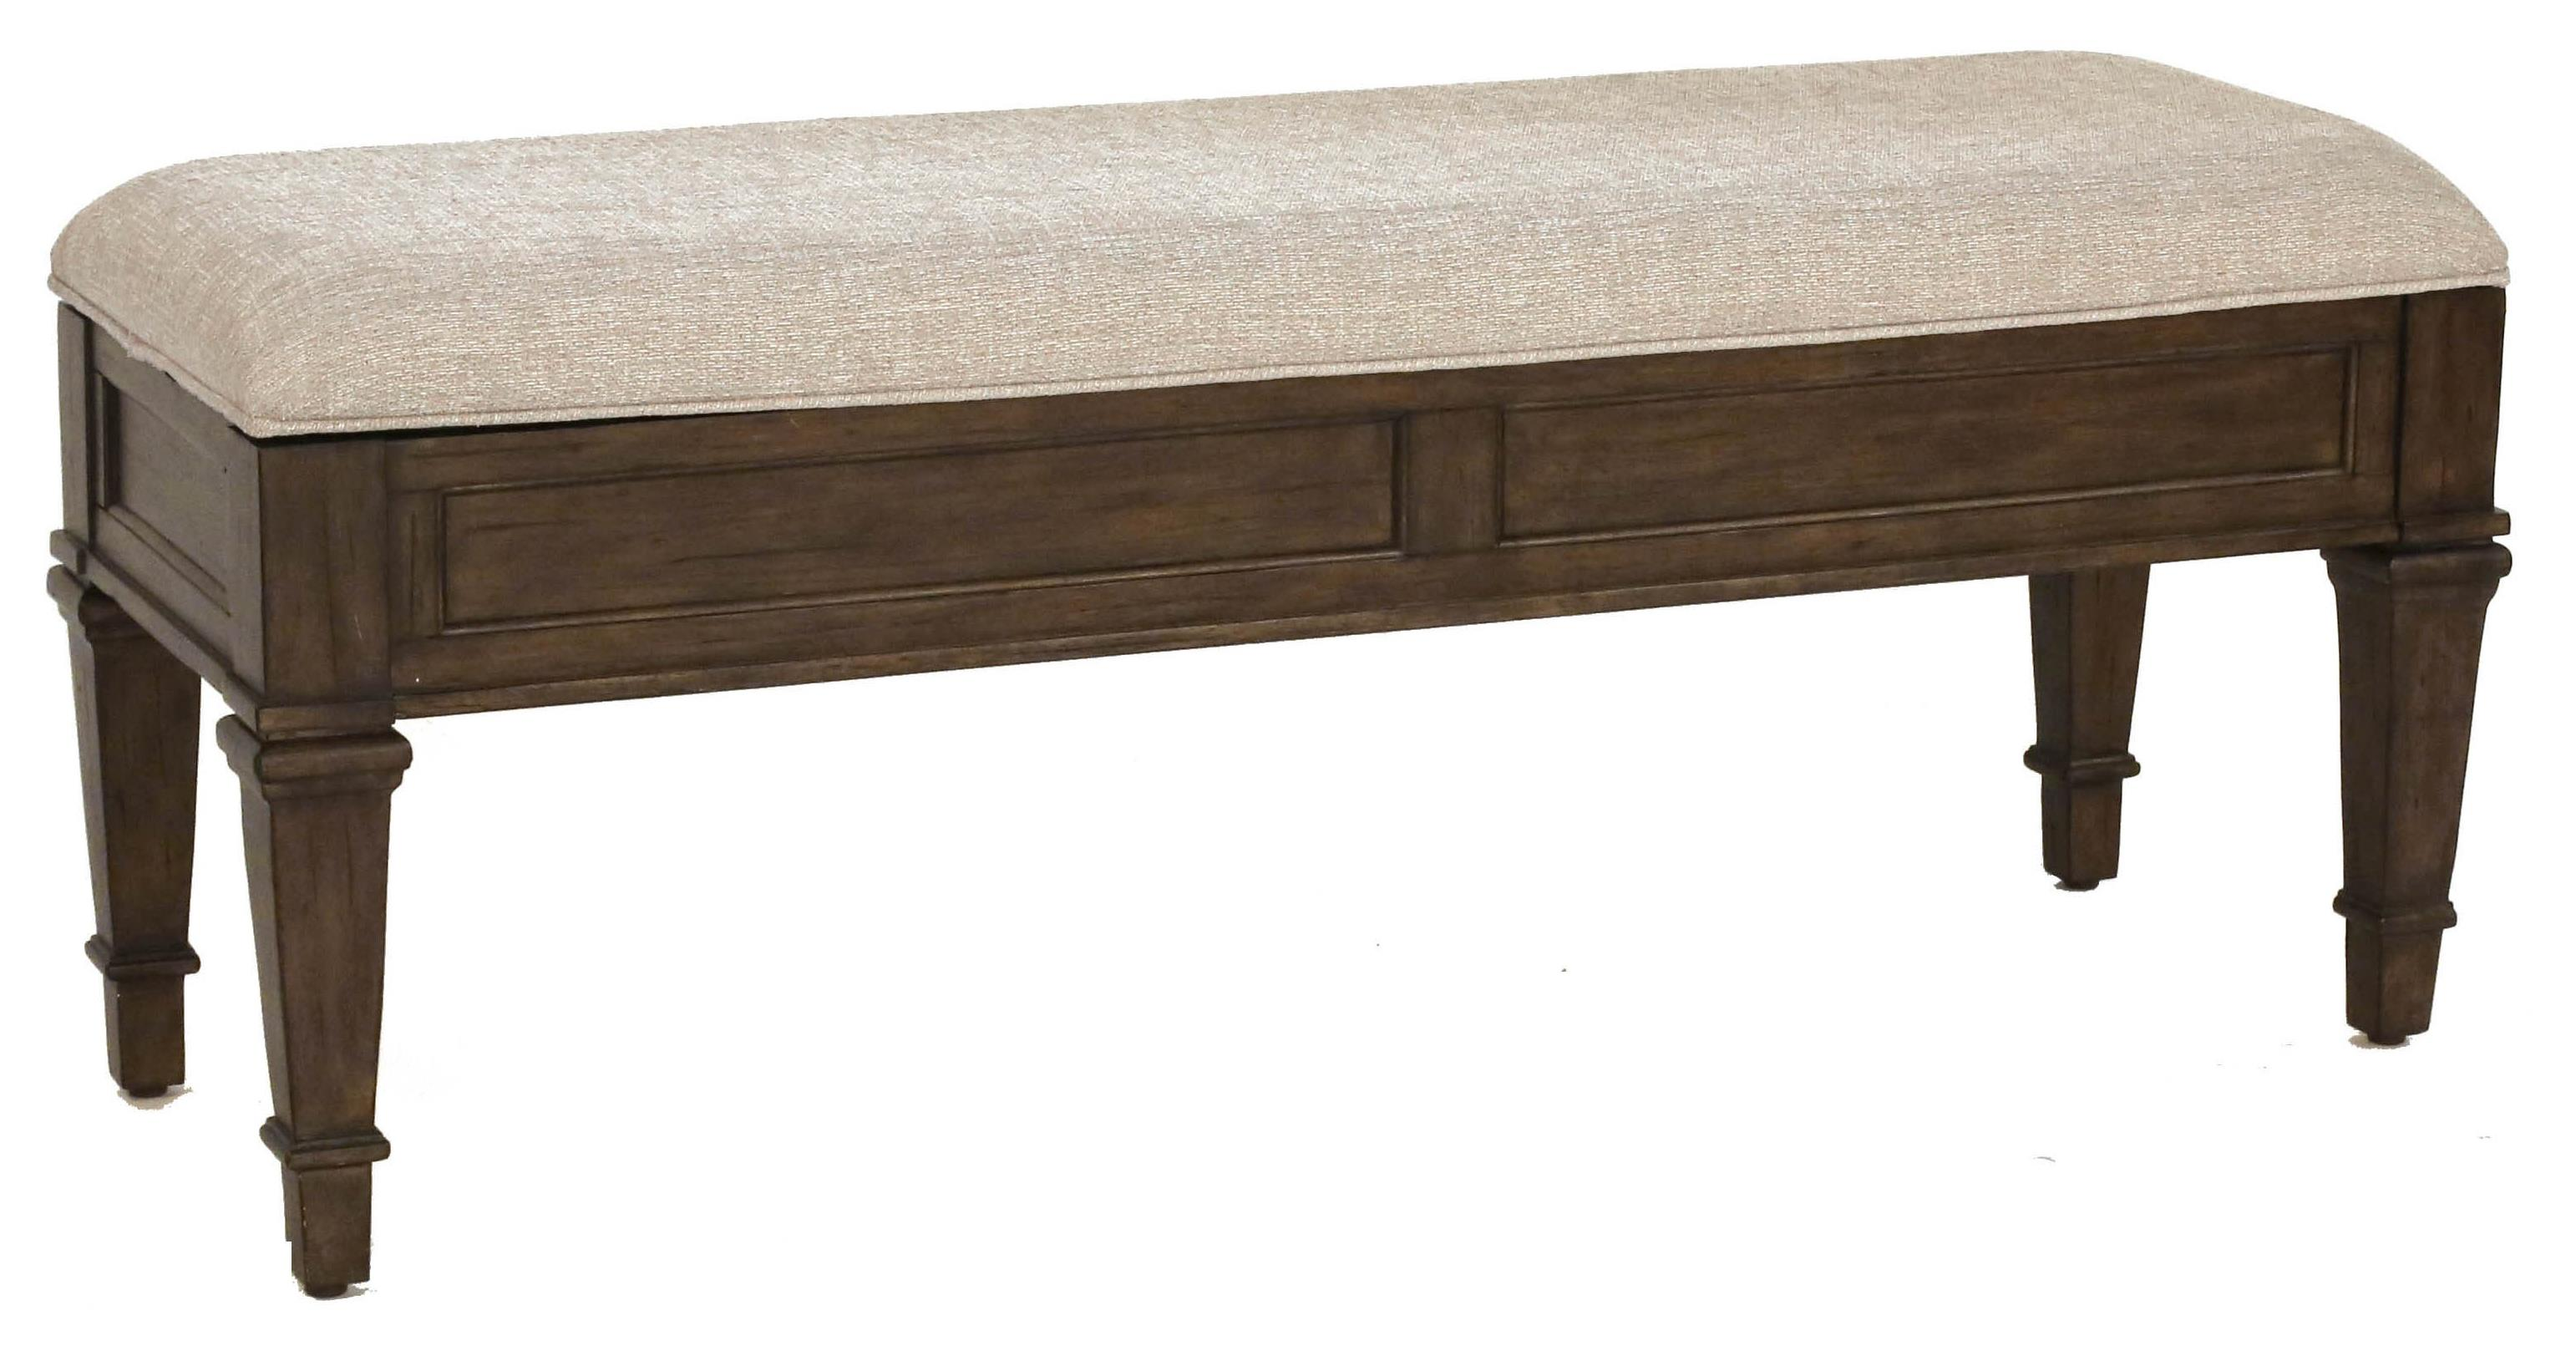 AAmerica Gallatin Upholstered Storage Bench - Item Number: GLN-TM-5-95-0